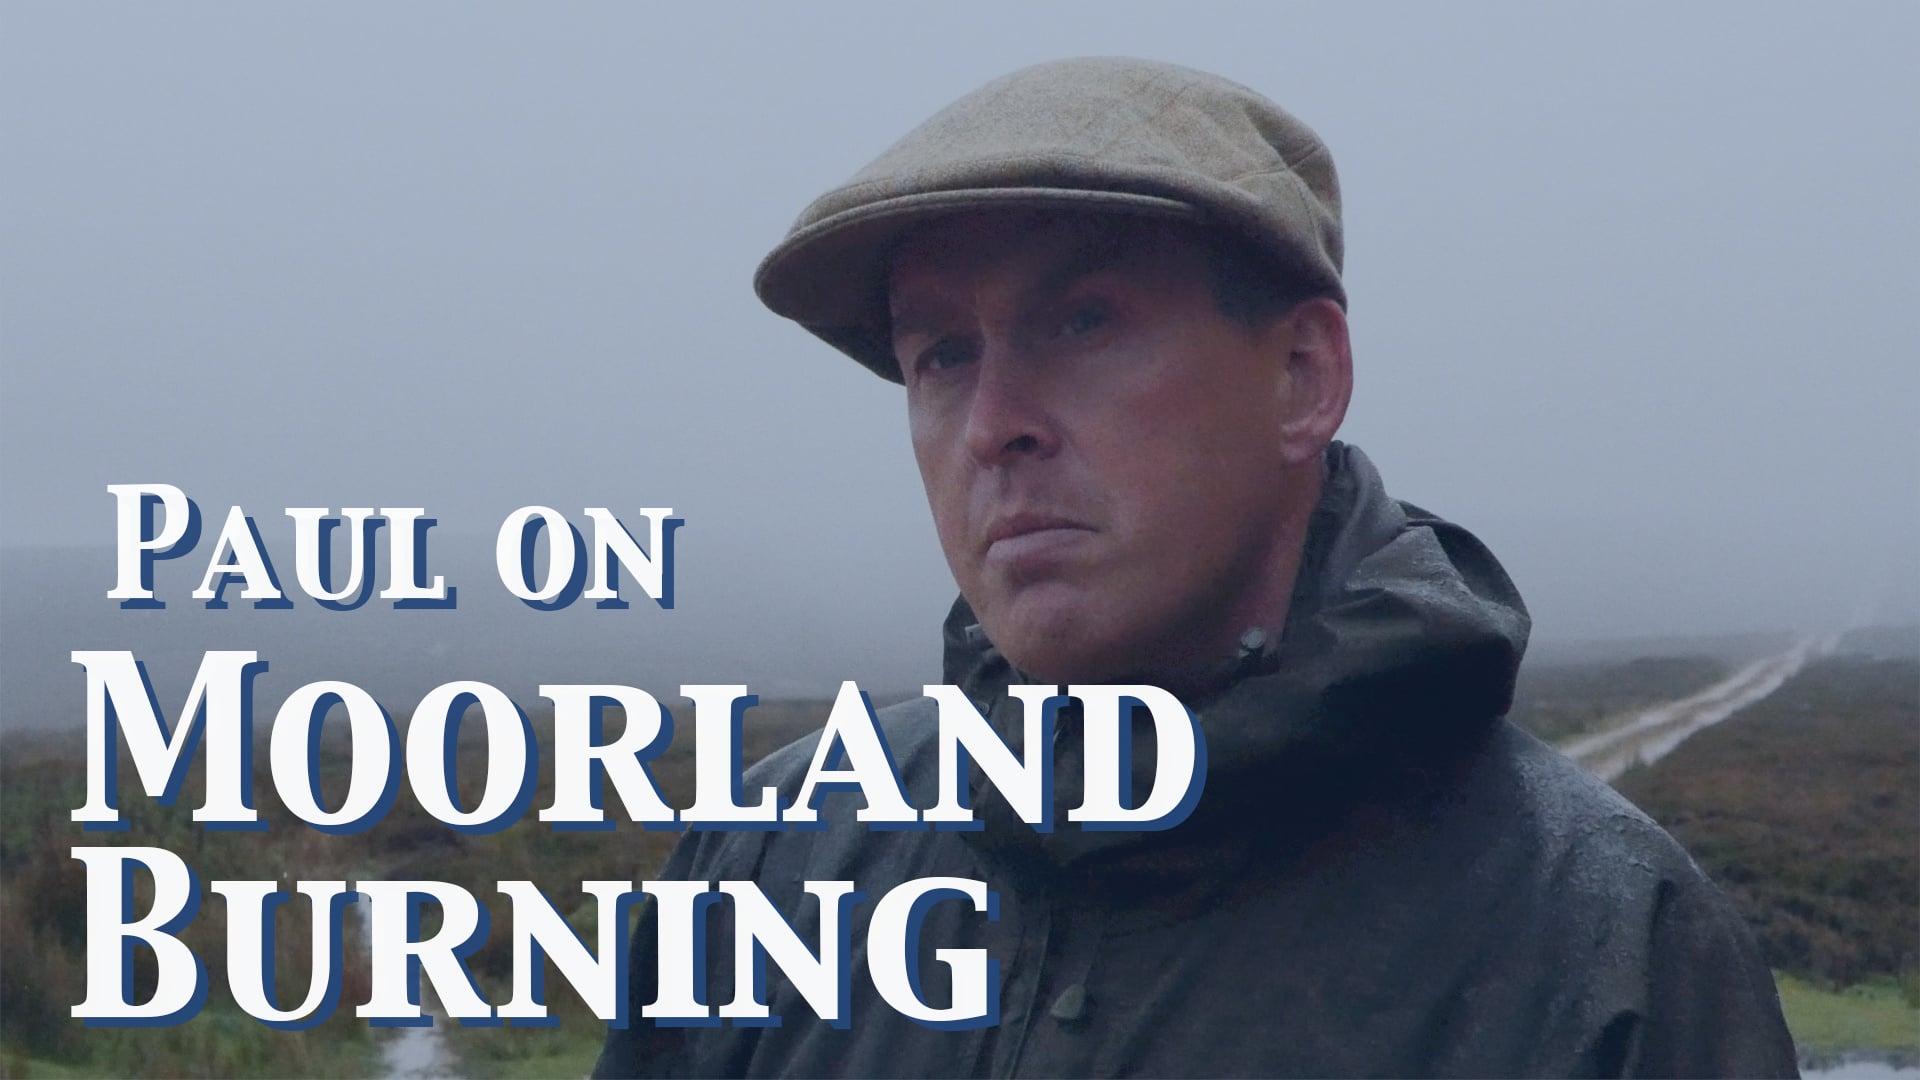 Paul on Moorland Burning